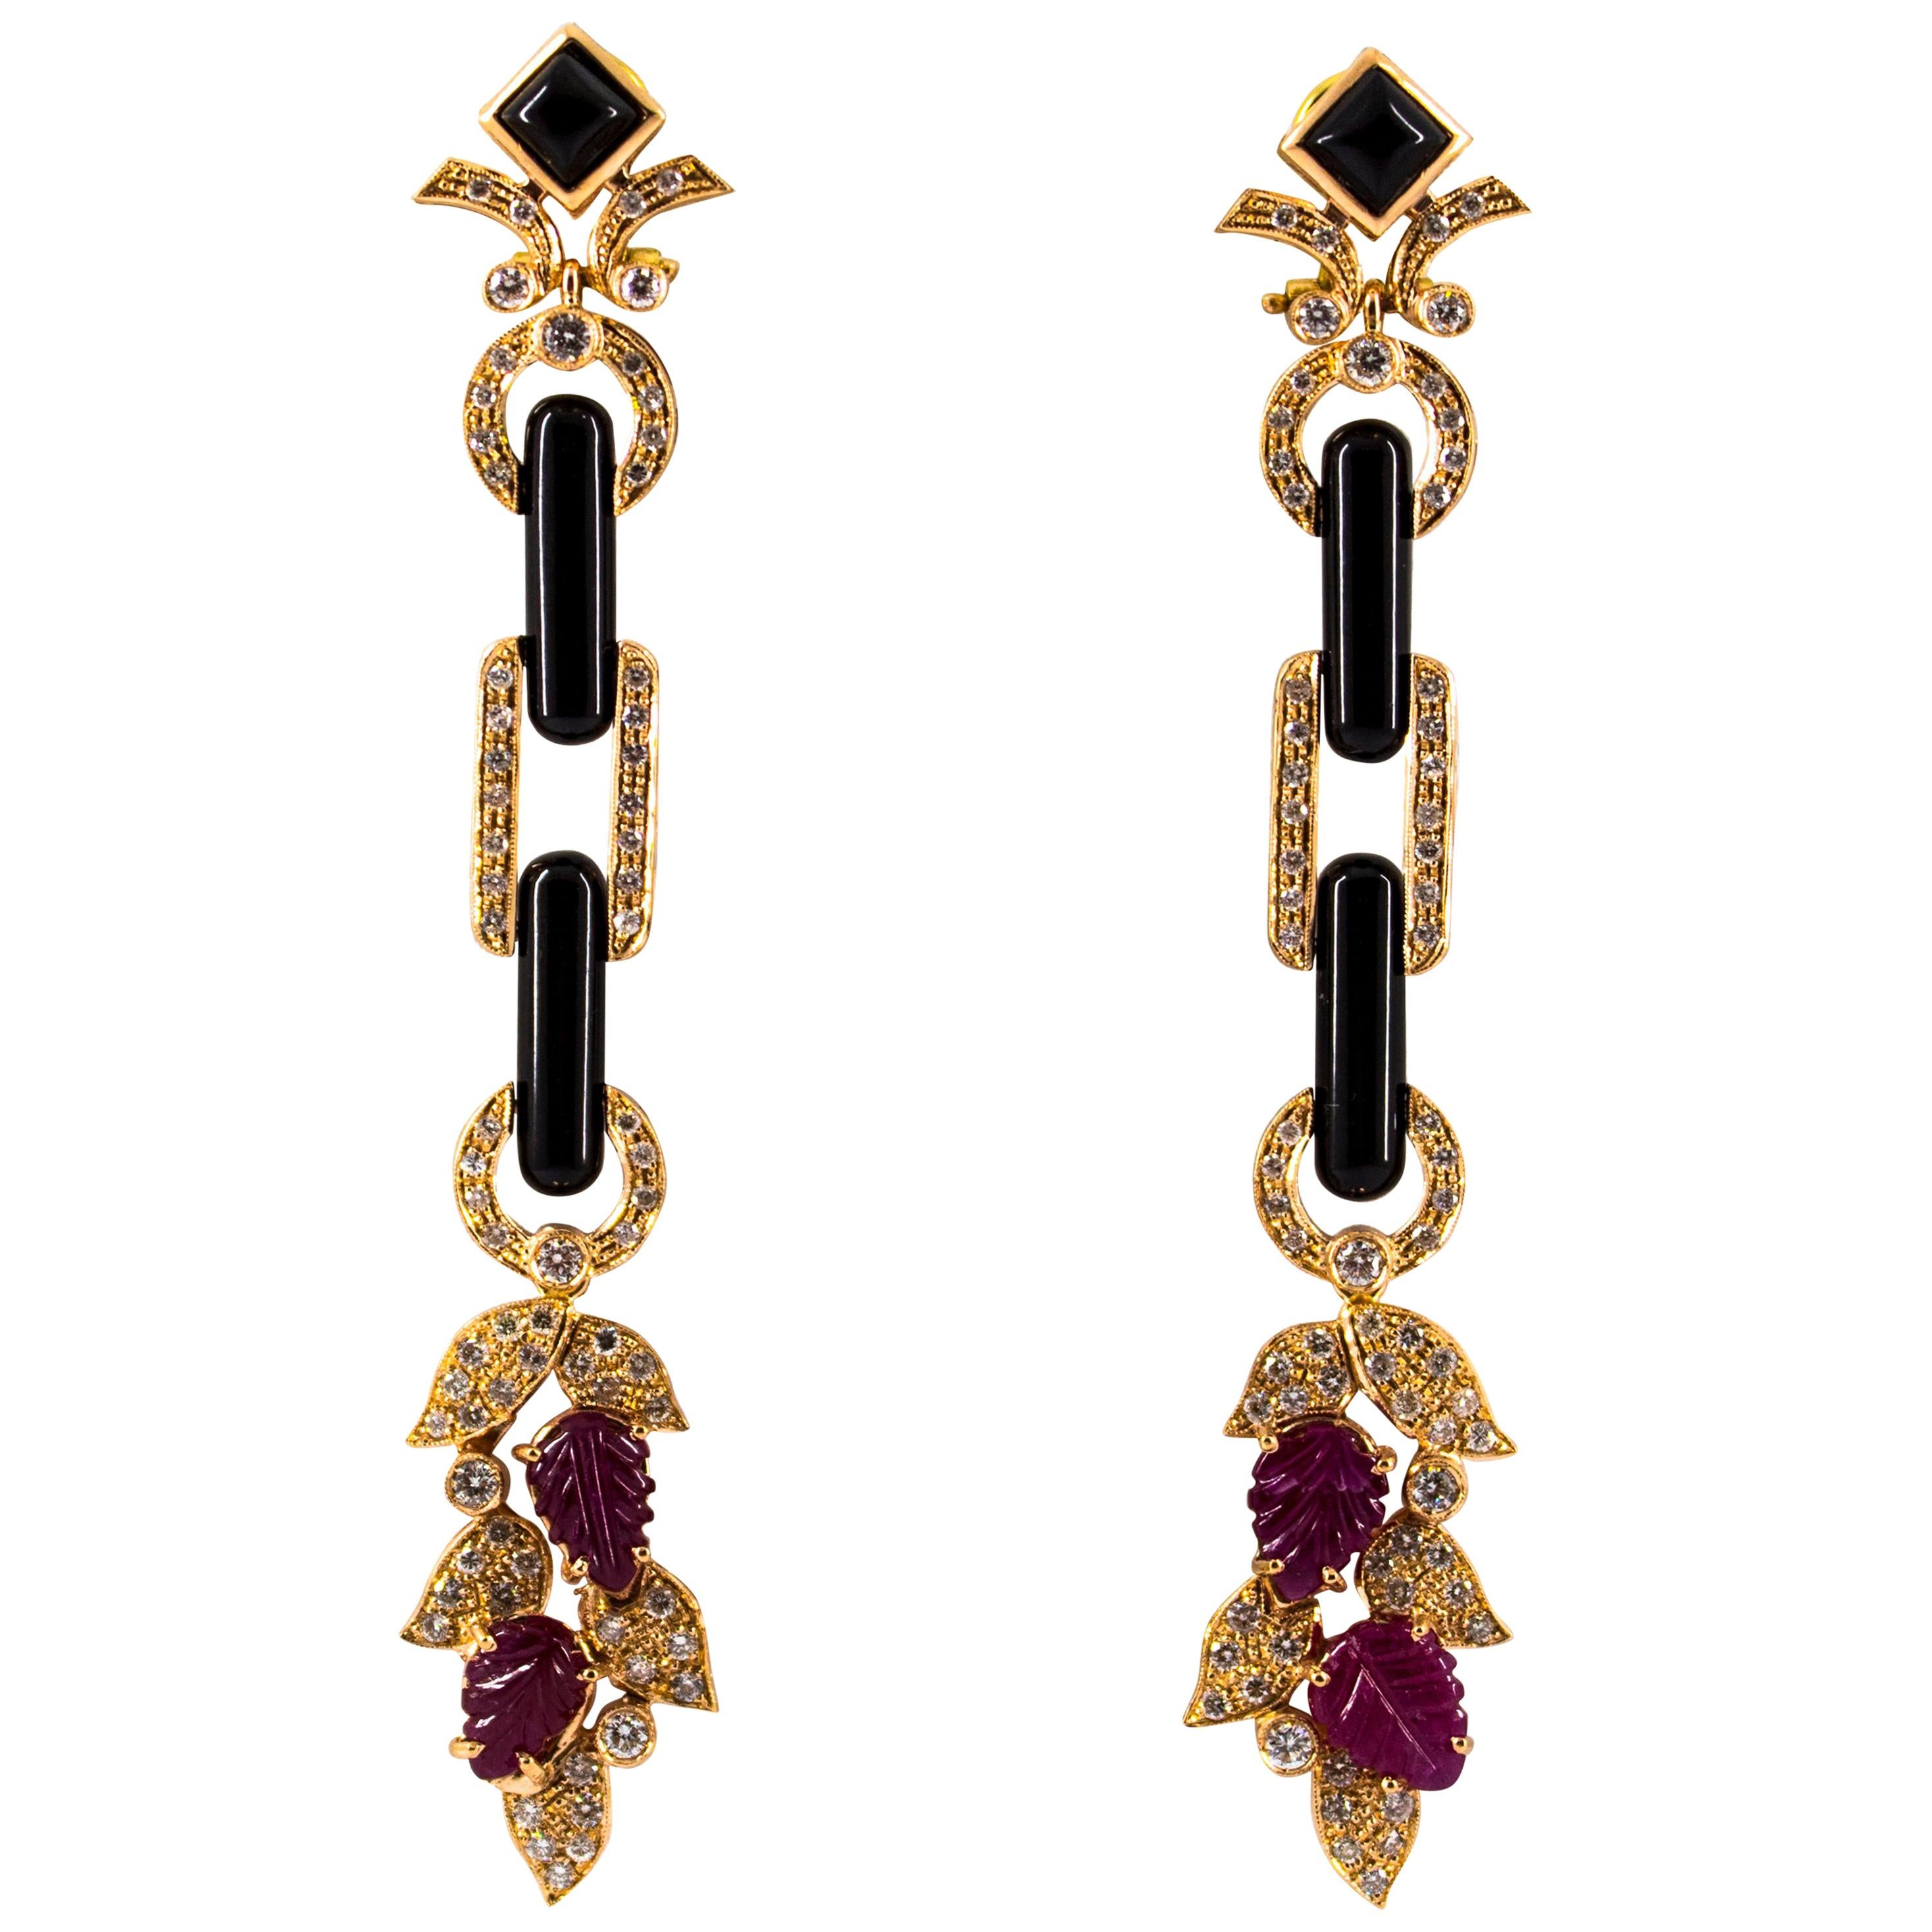 4.80 Carat Ruby 1.76 Carat White Diamond Onyx Yellow Gold Clip-On Drop Earrings